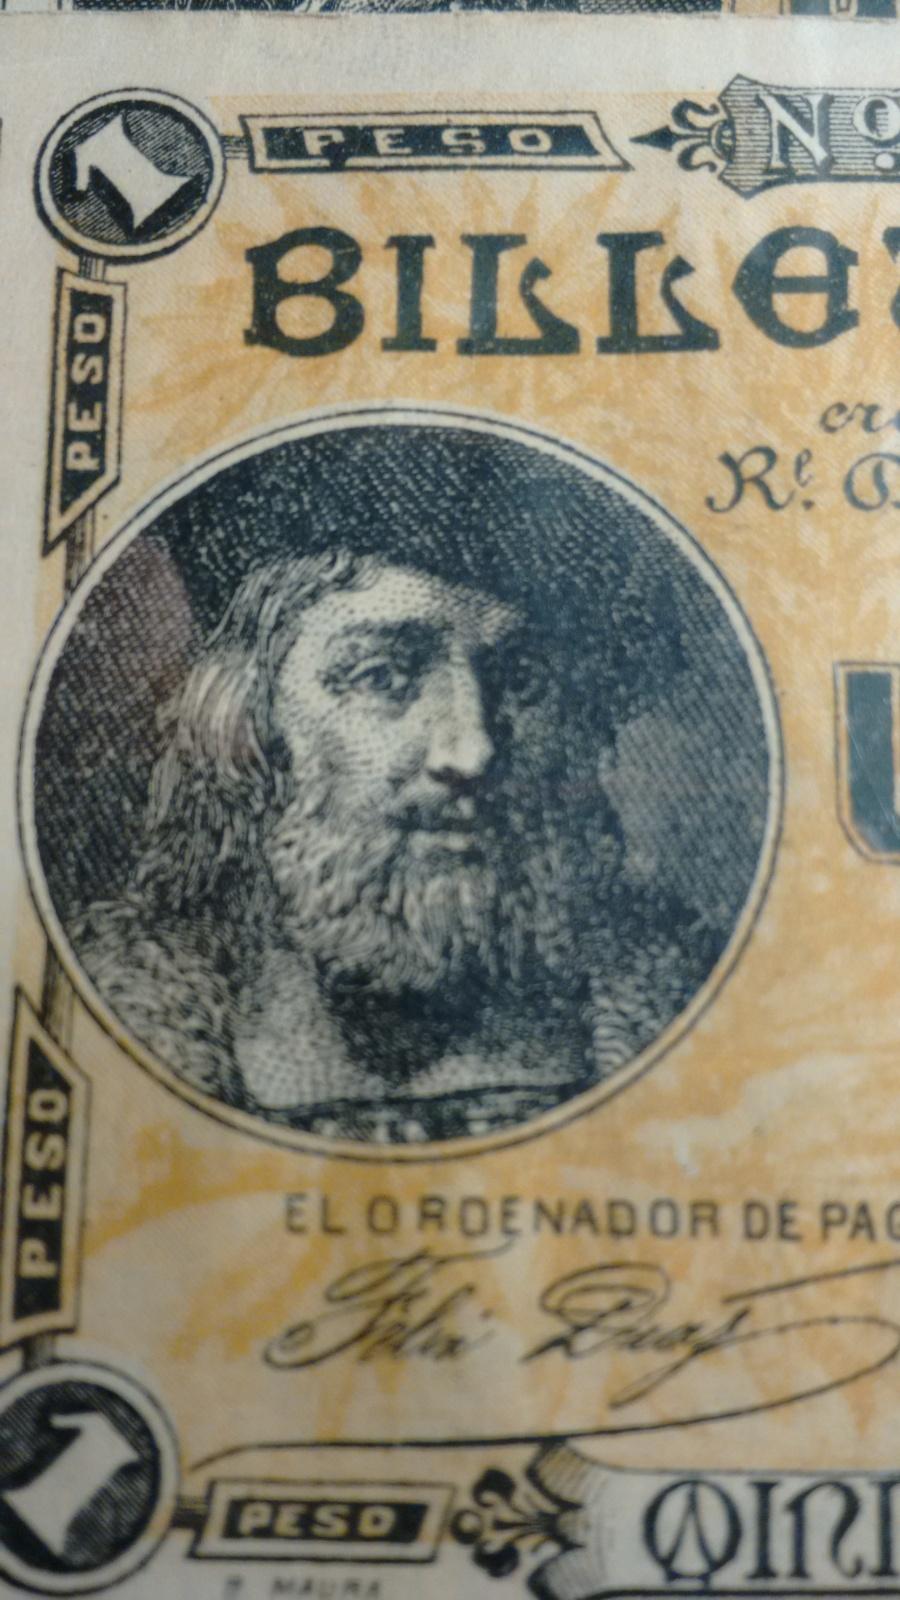 1 Peso 1895 Ultramar PUERTO RICO - Pareja correlativa - Ponce de León 2586qsm